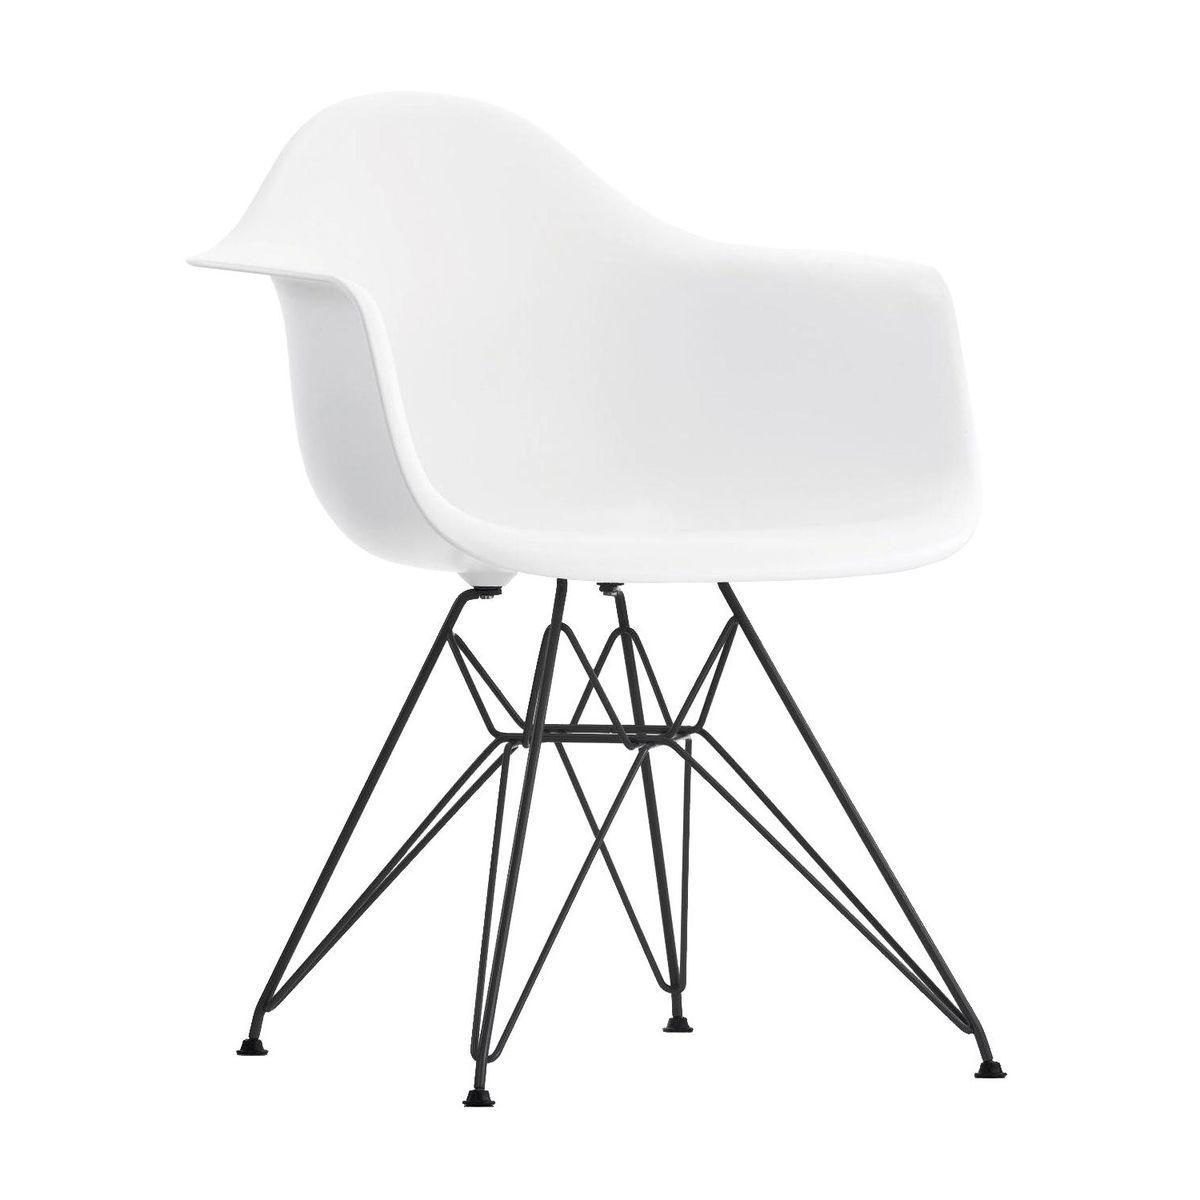 eames plastic chair dar black frame hcm  vitra  ambientedirectcom. vitra  eames plastic chair dar black frame hcm  whiteeiffel towerframe basic